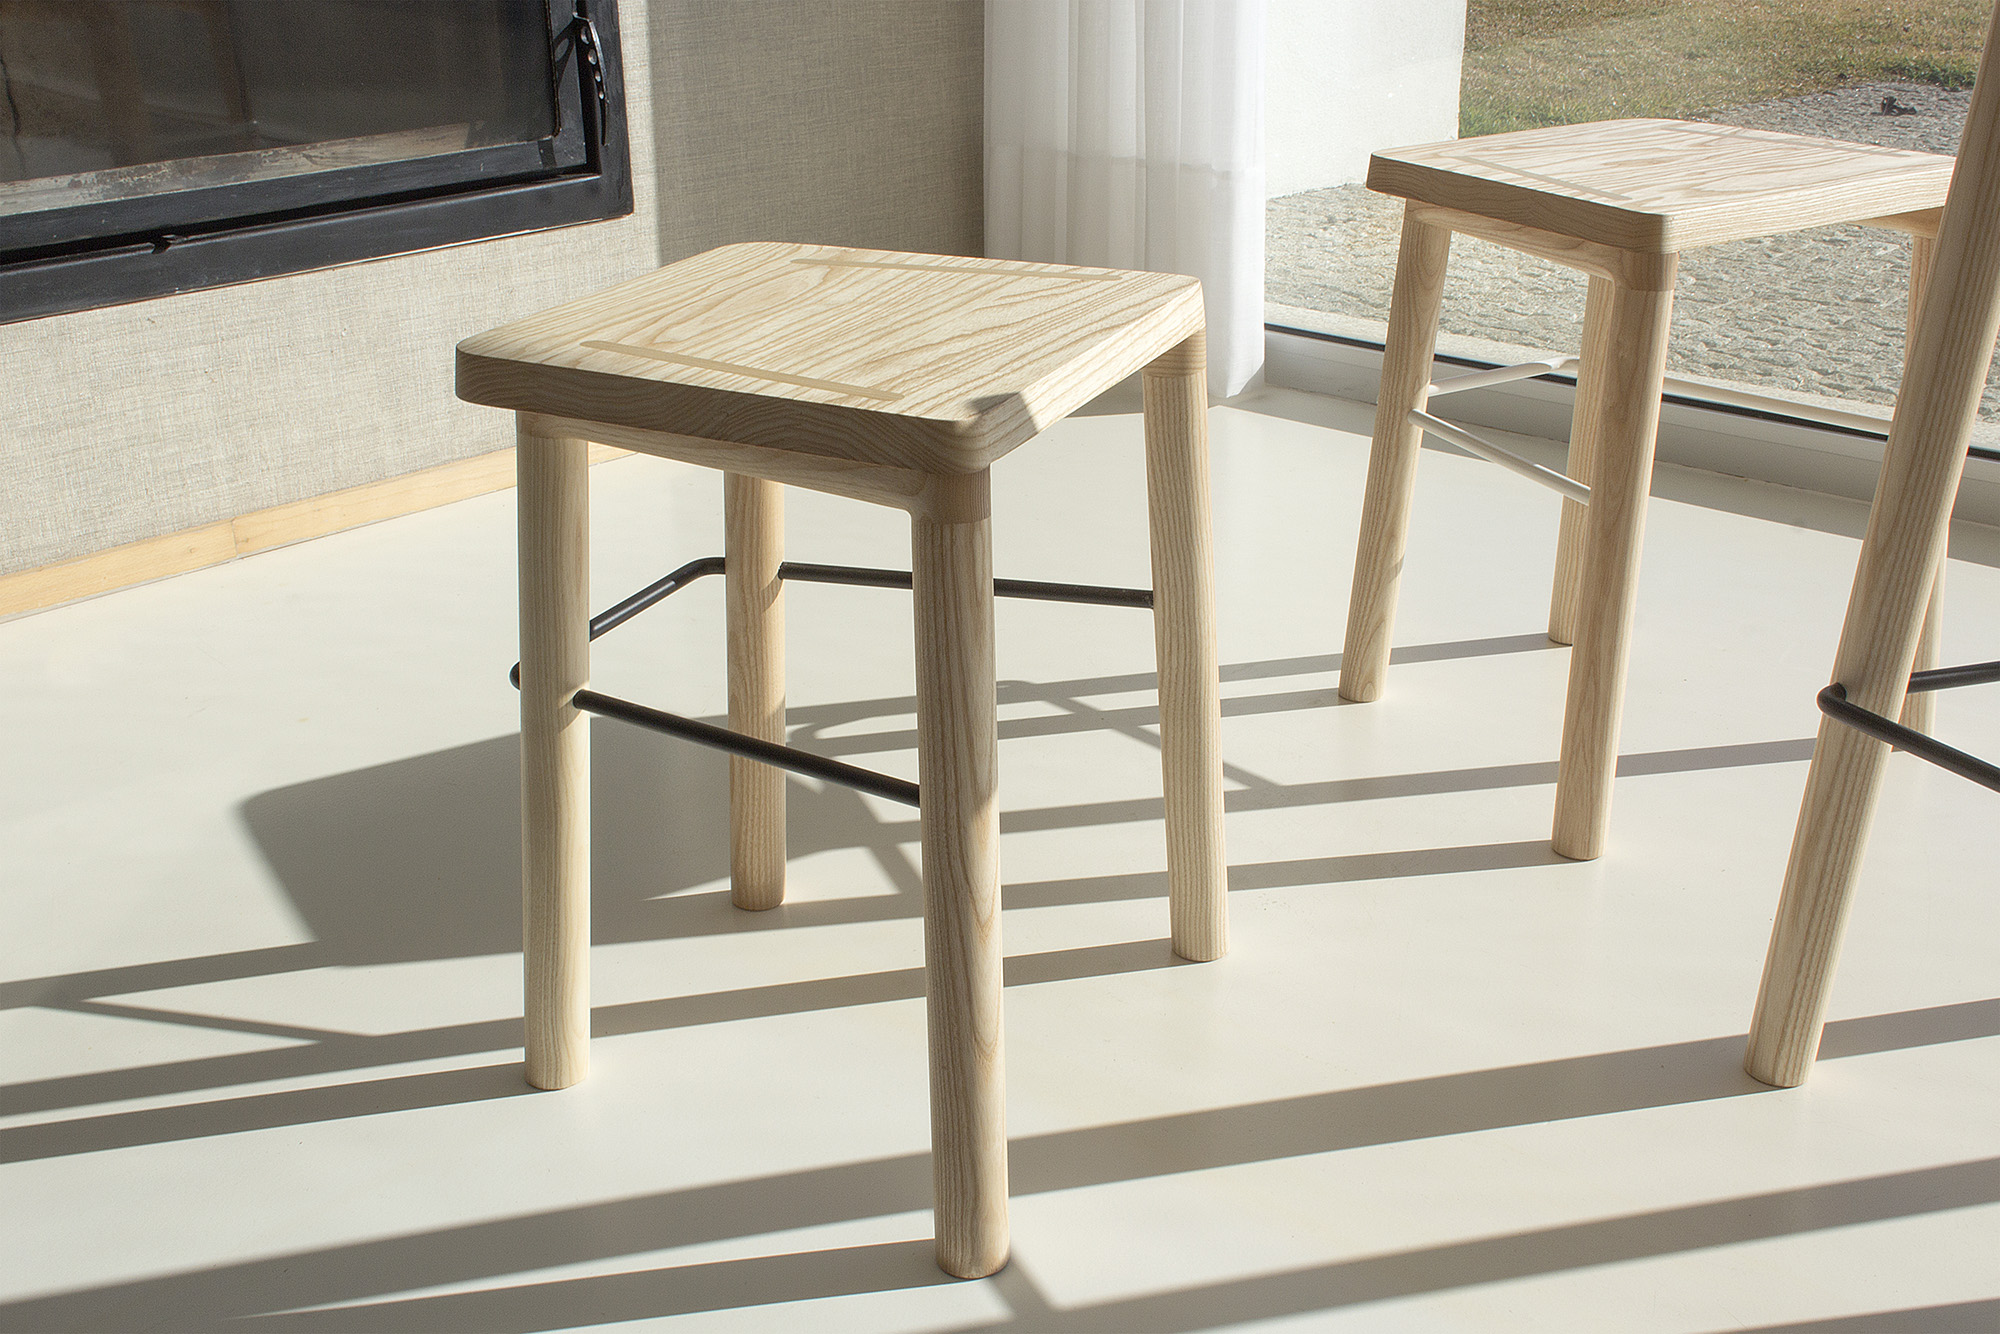 low-Galula-taberna-low-stool-amb-ash-2.jpg